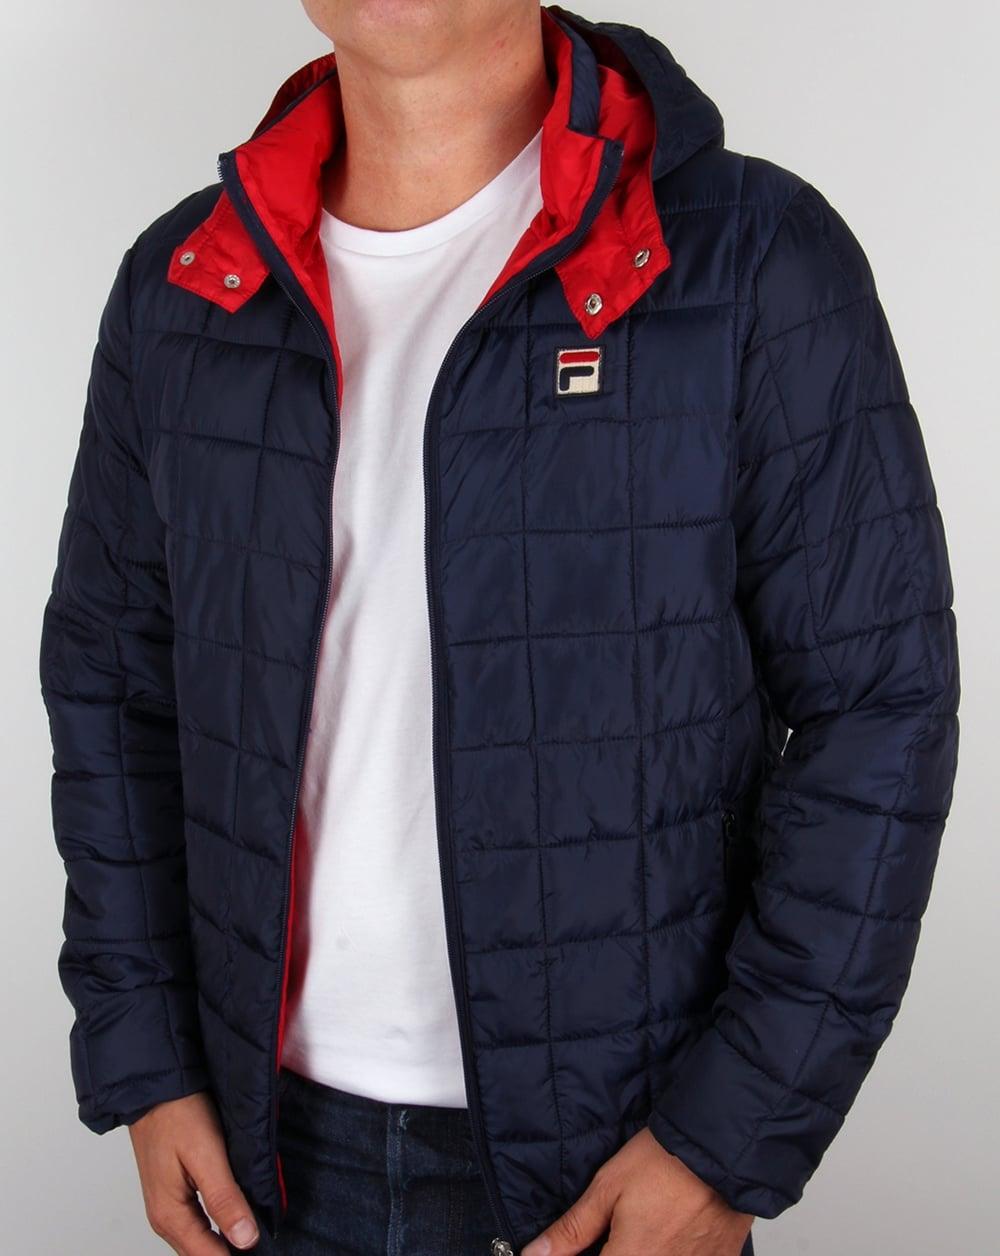 Mens Patagonia Jacket